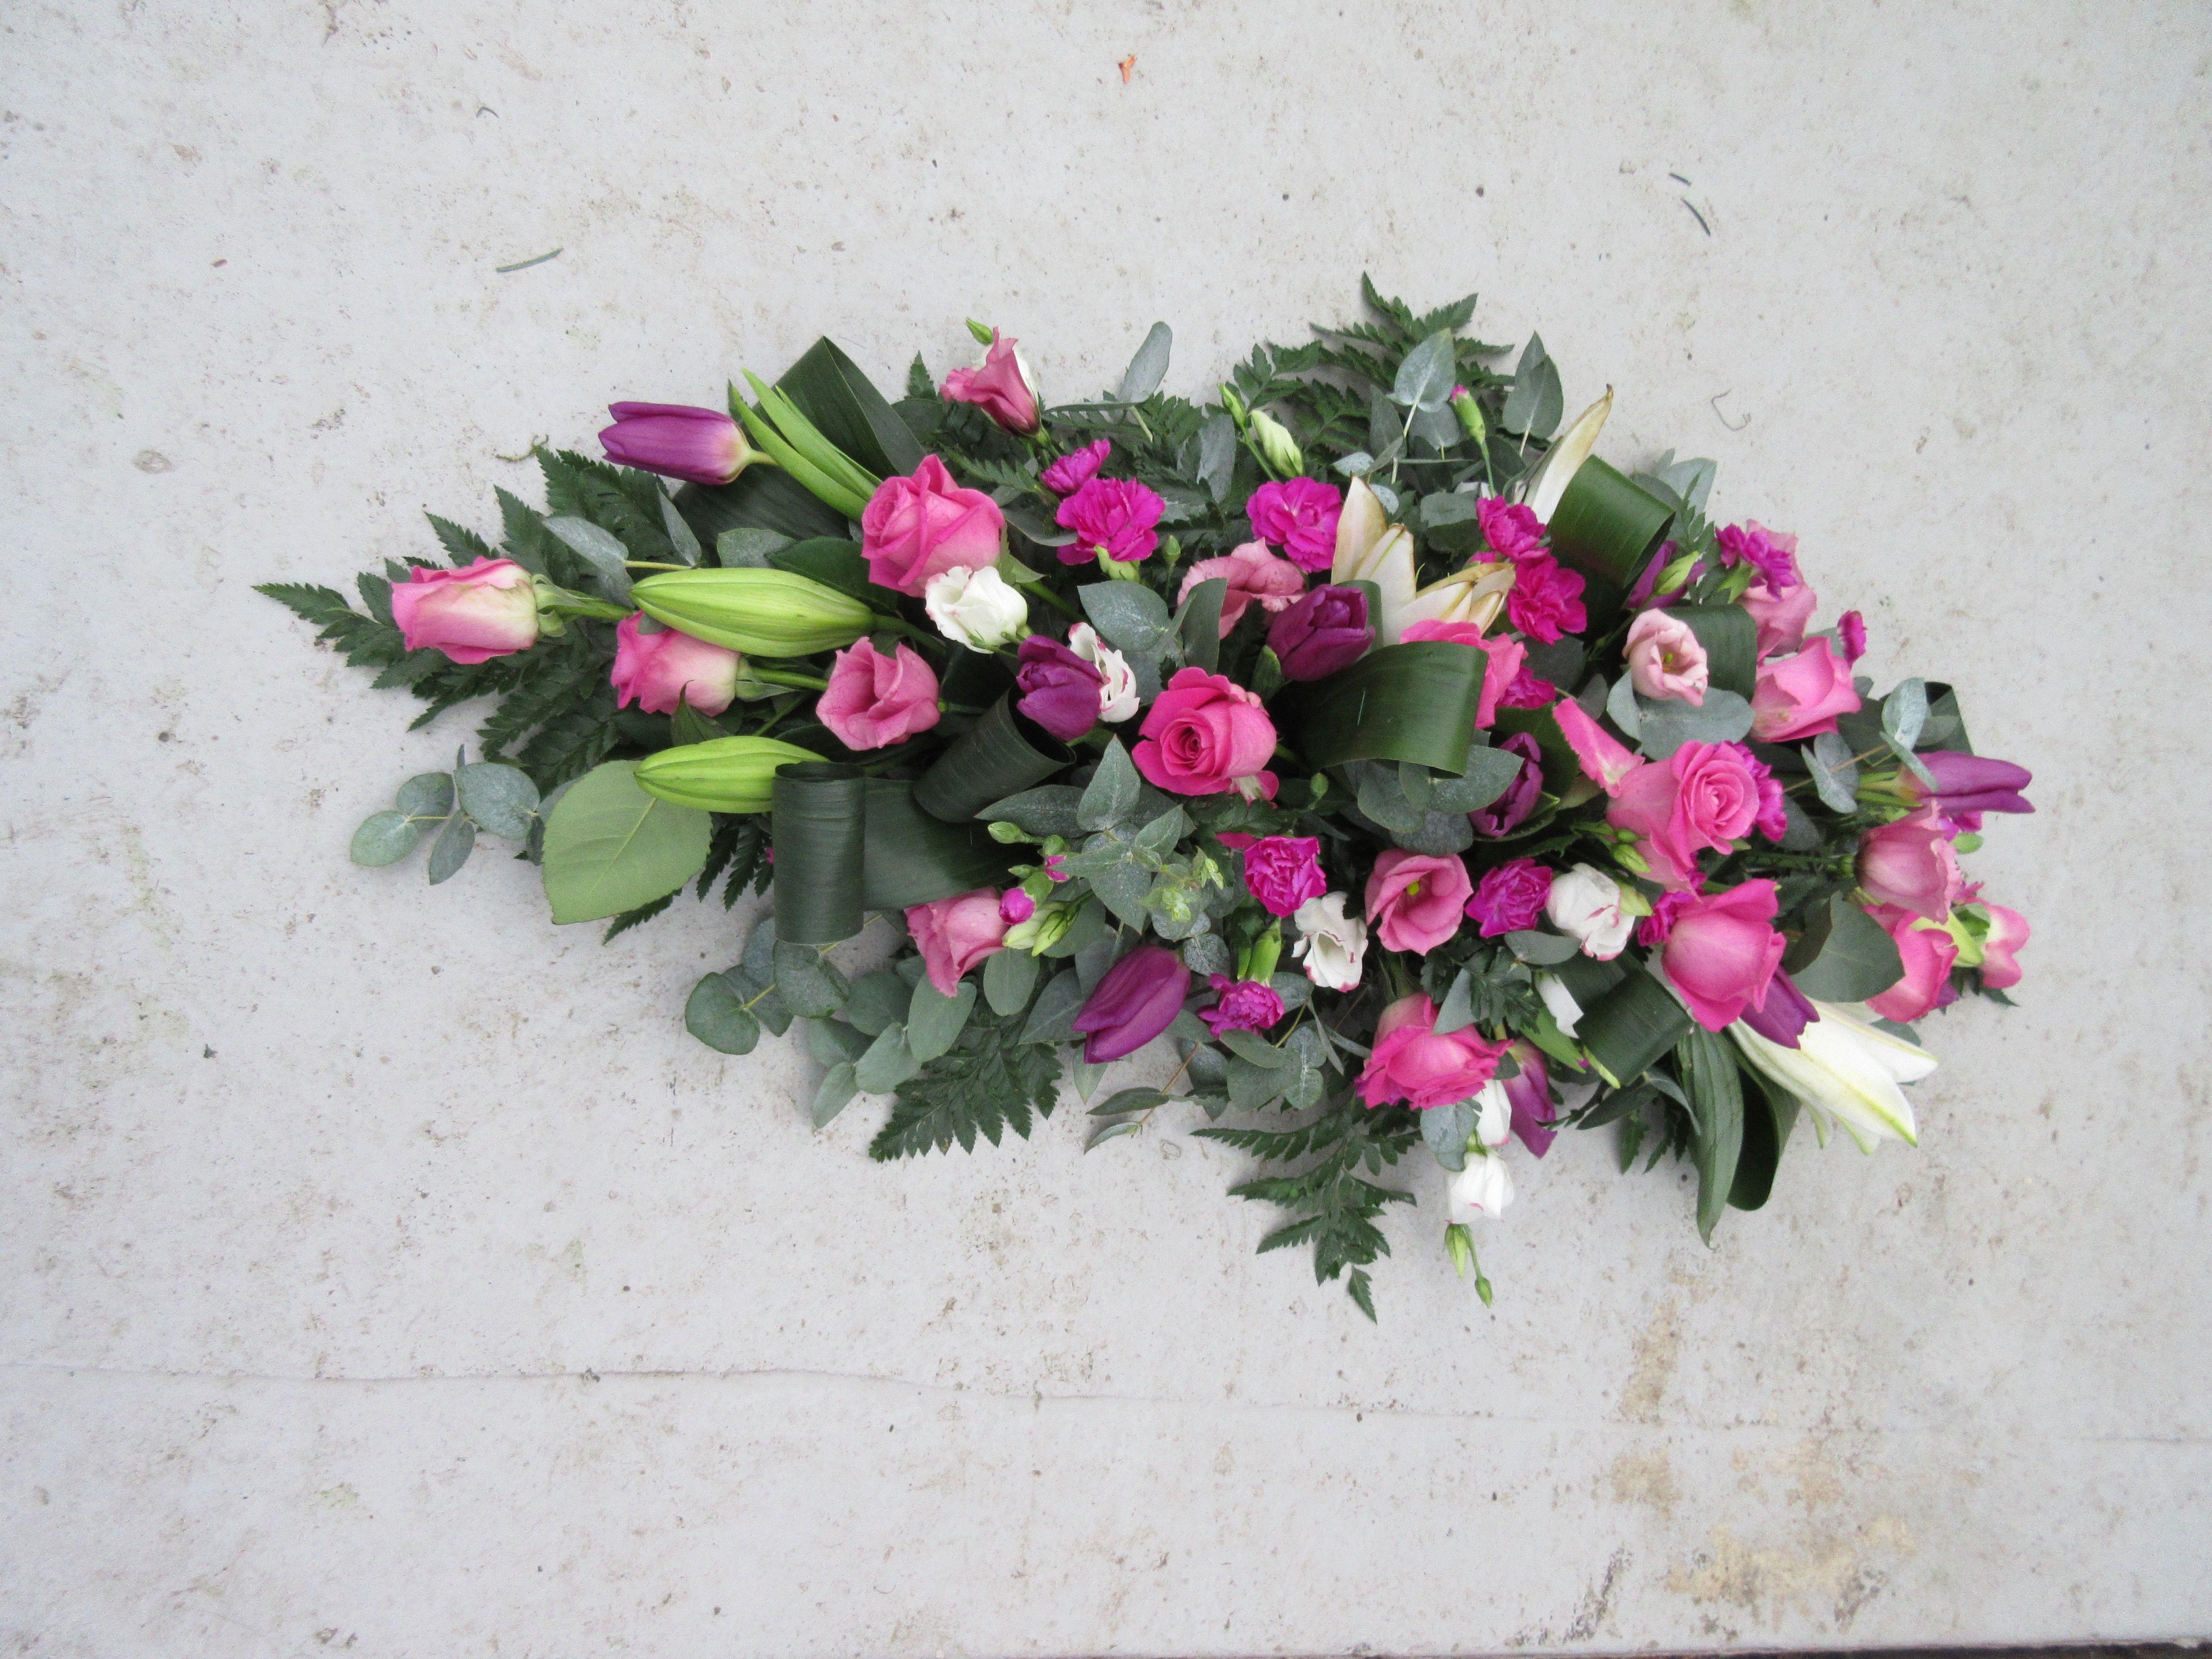 Pin by regina patt on nonnie pinterest funeral flowers and flowers funeral flowers sprays izmirmasajfo